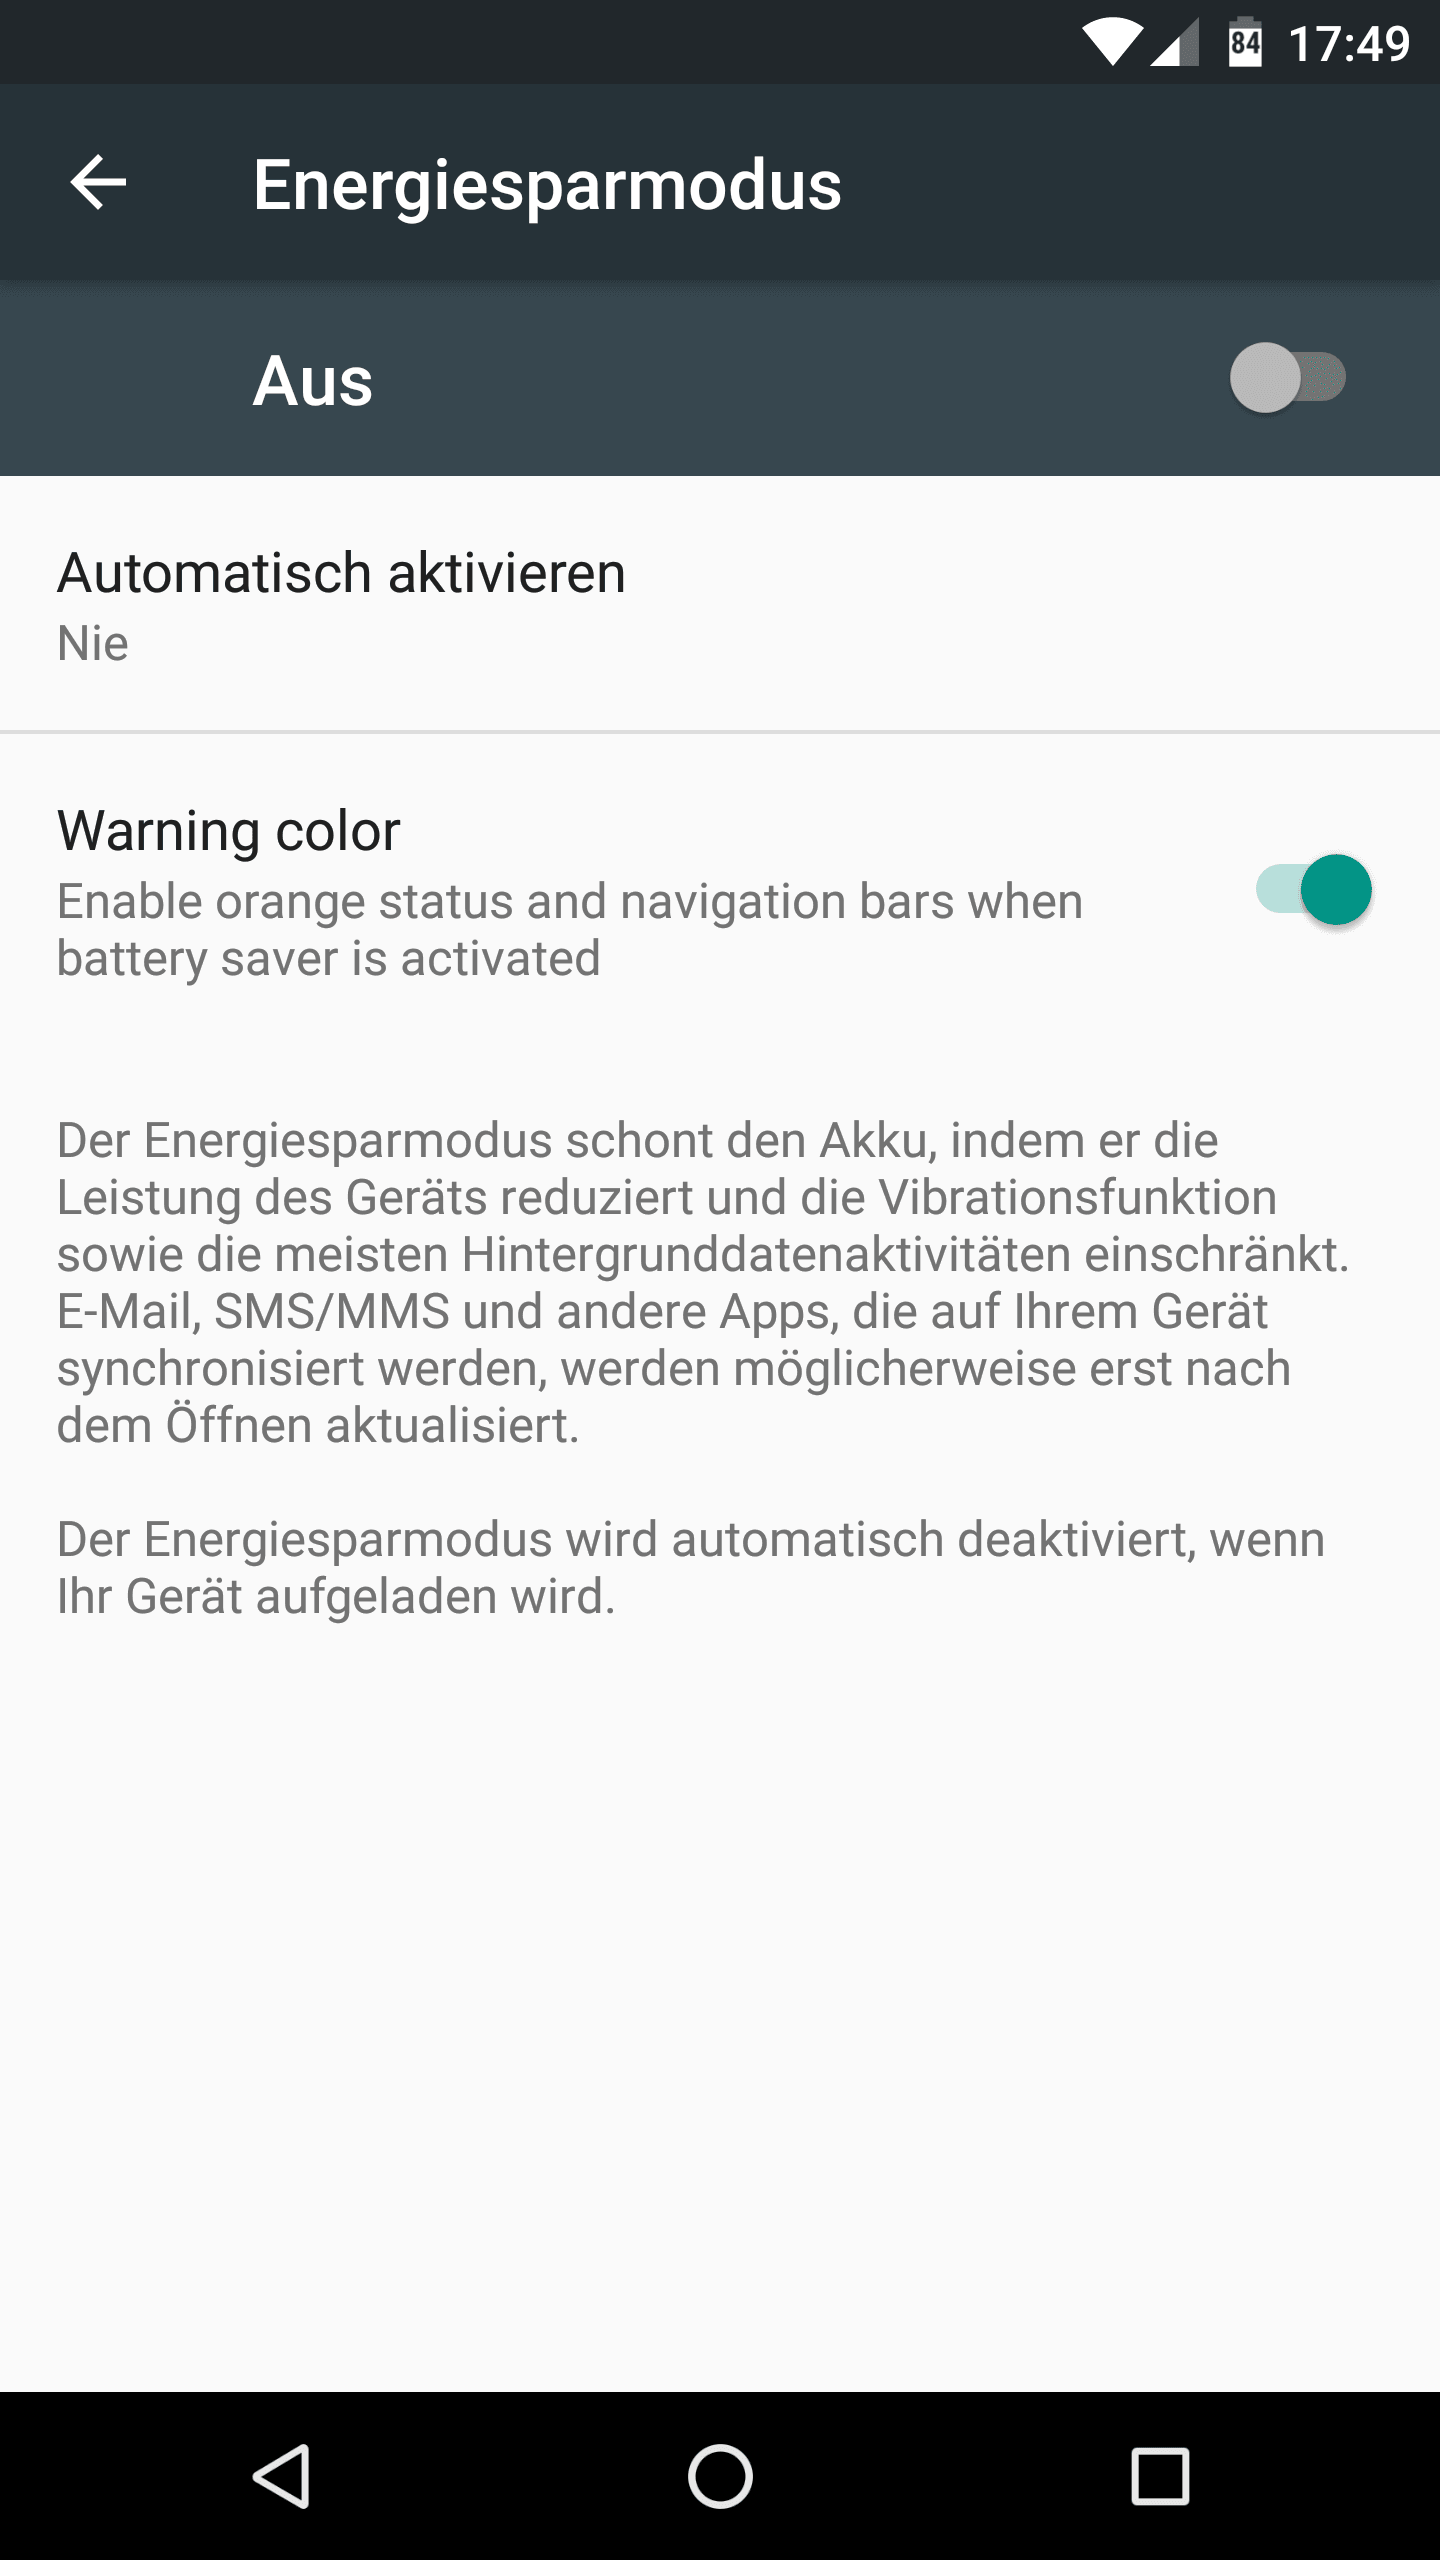 Anleitung: Doze deaktivieren unter Android Nougat & Marshmallow 12 techboys.de • smarte News, auf den Punkt! Anleitung: Doze deaktivieren unter Android Nougat & Marshmallow